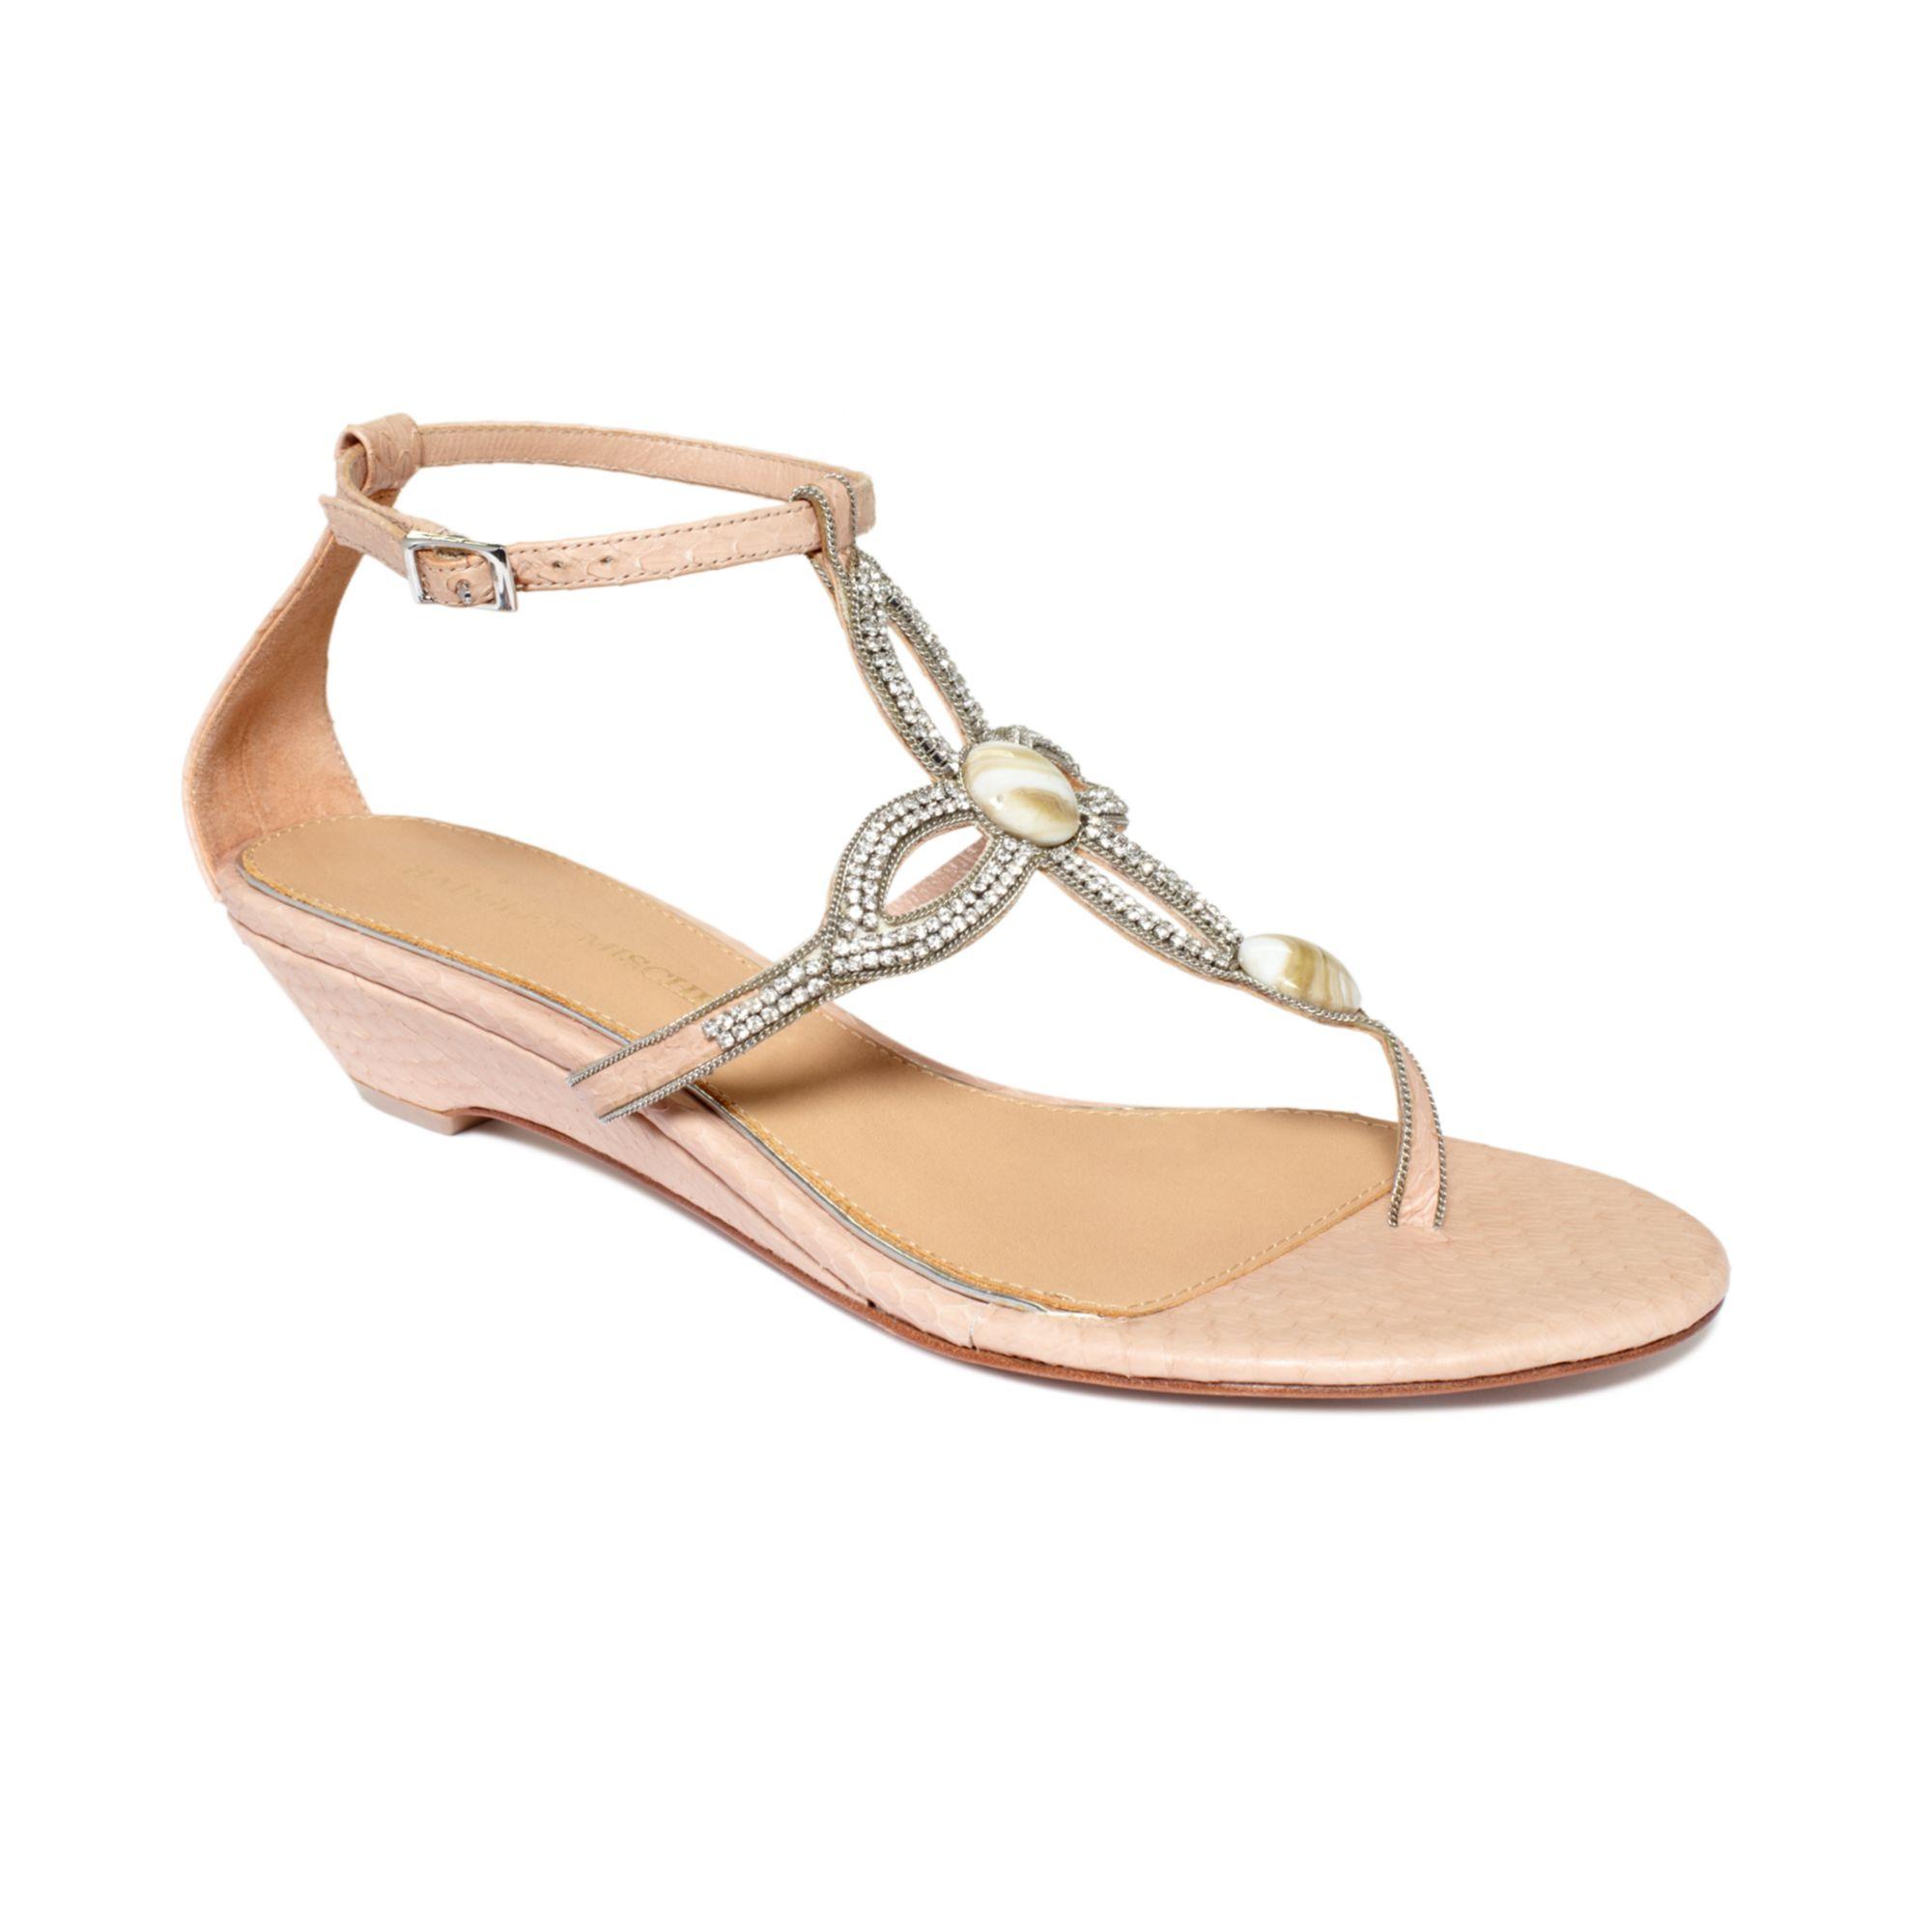 badgley mischka coye demi wedge sandals in beige